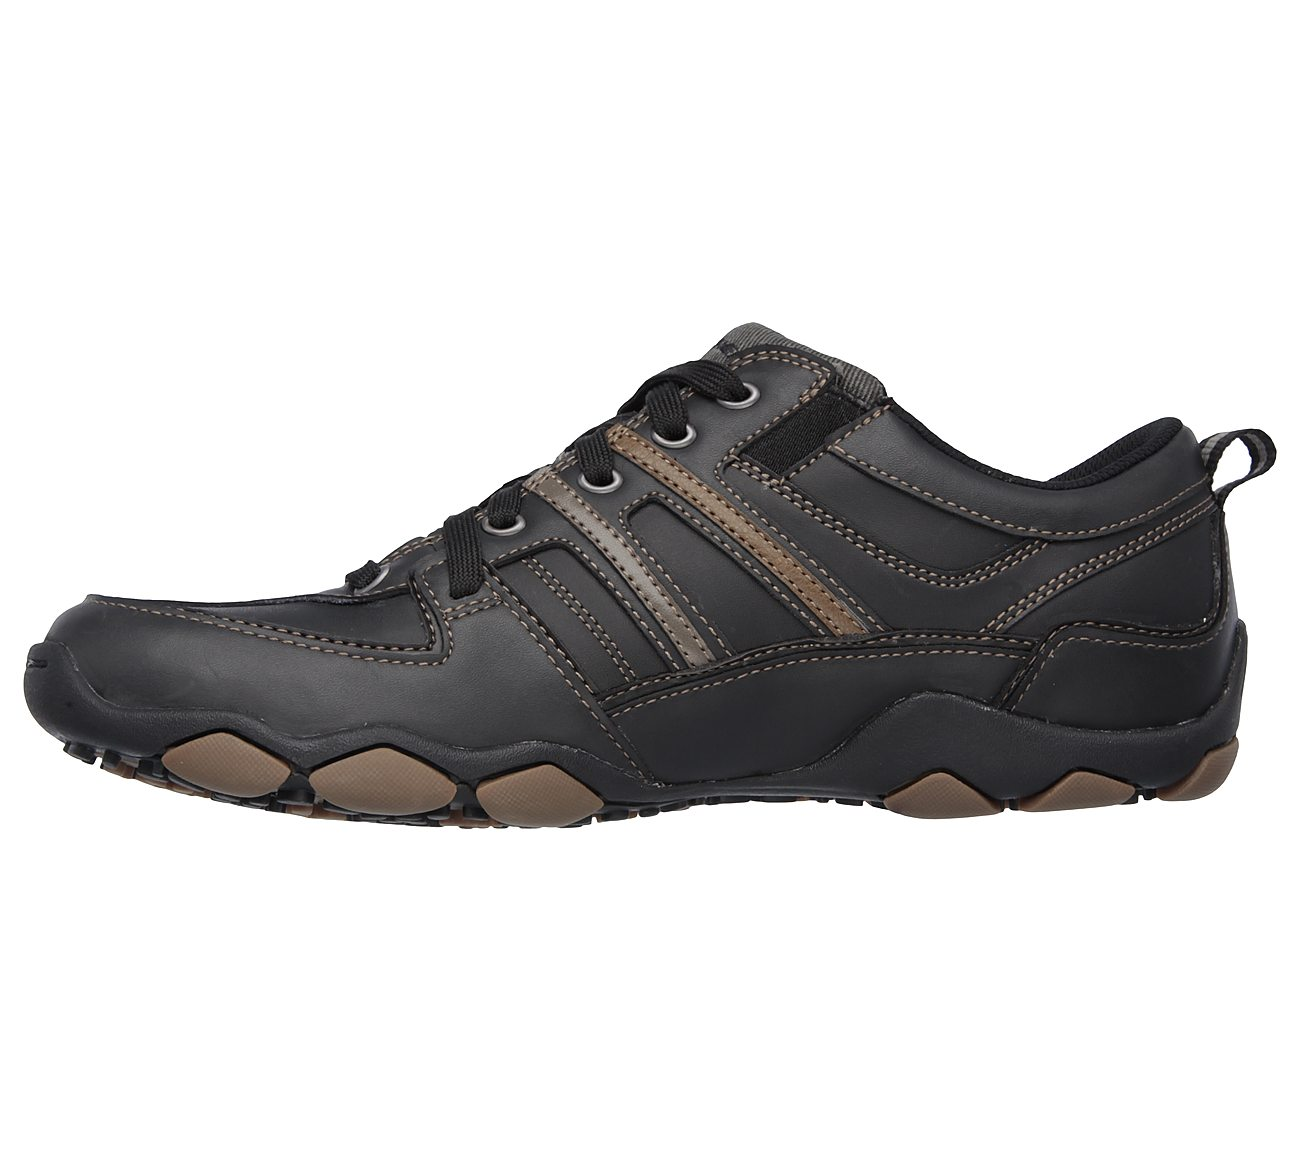 22eeef3bd3ab Buy SKECHERS Diameter - Selent Shoes only  80.00